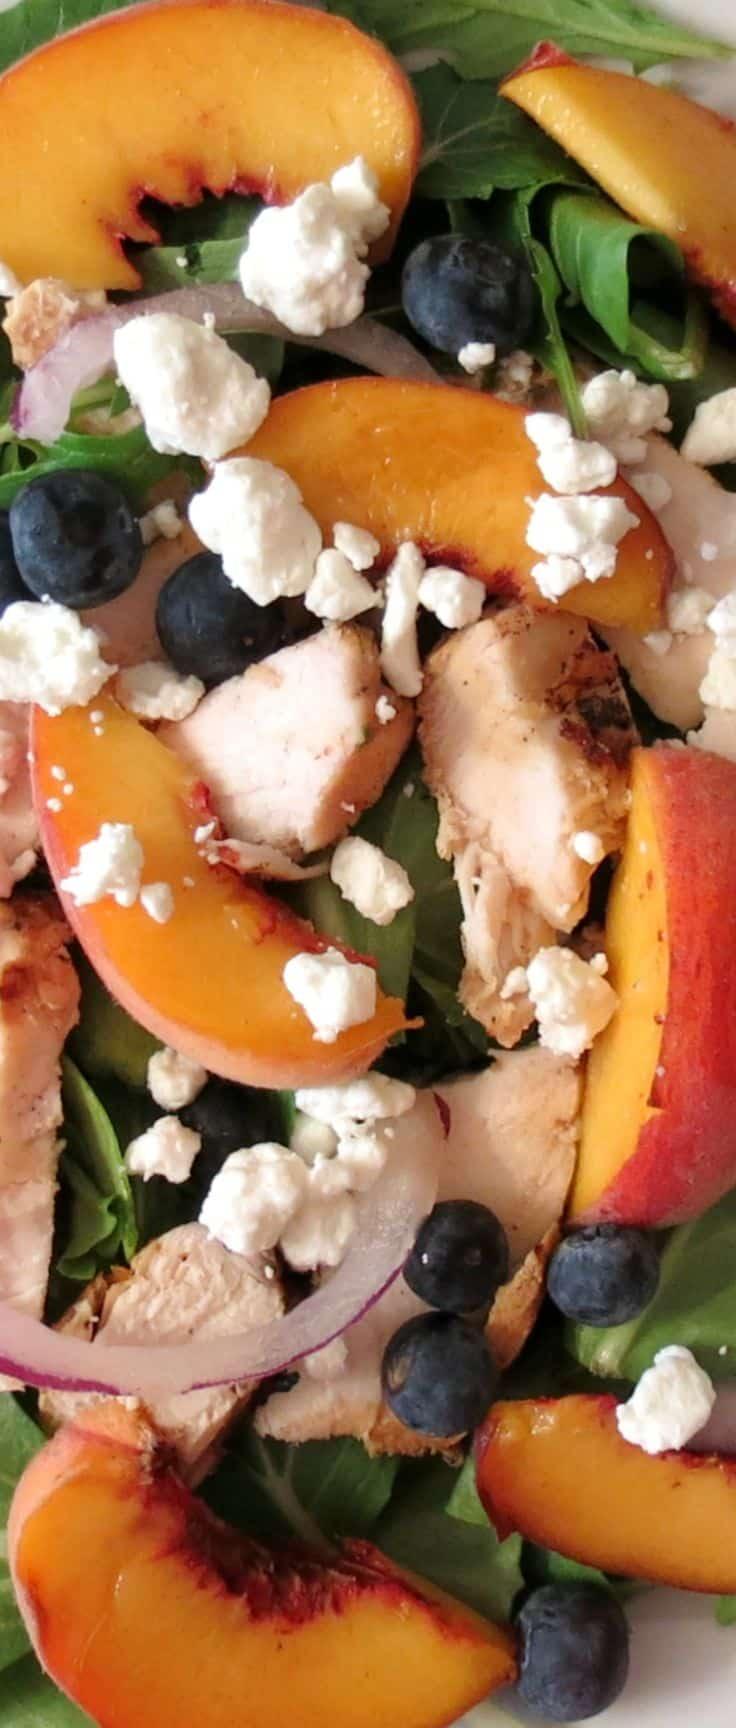 Blueberry Peach Chicken Salad - 25-Plus Perfect Peach Recipes